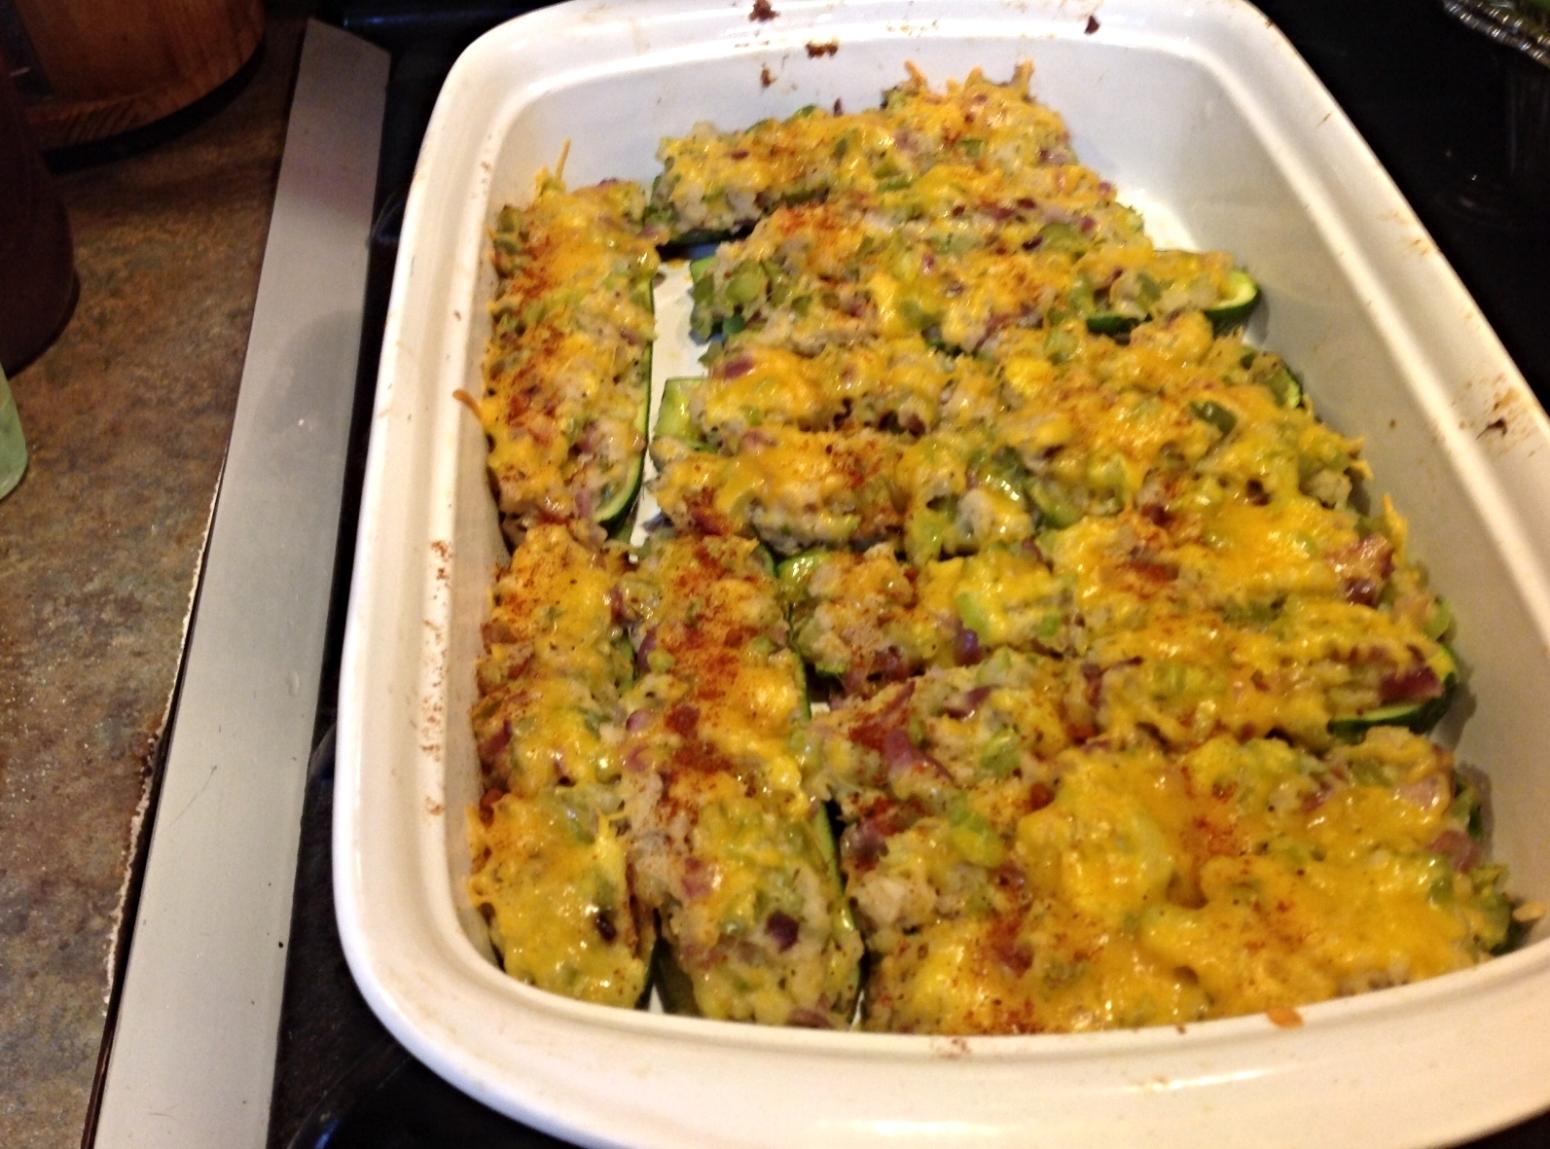 CHEESY STUFFED ZUCCHINI BOATS Recipe | Just A Pinch Recipes